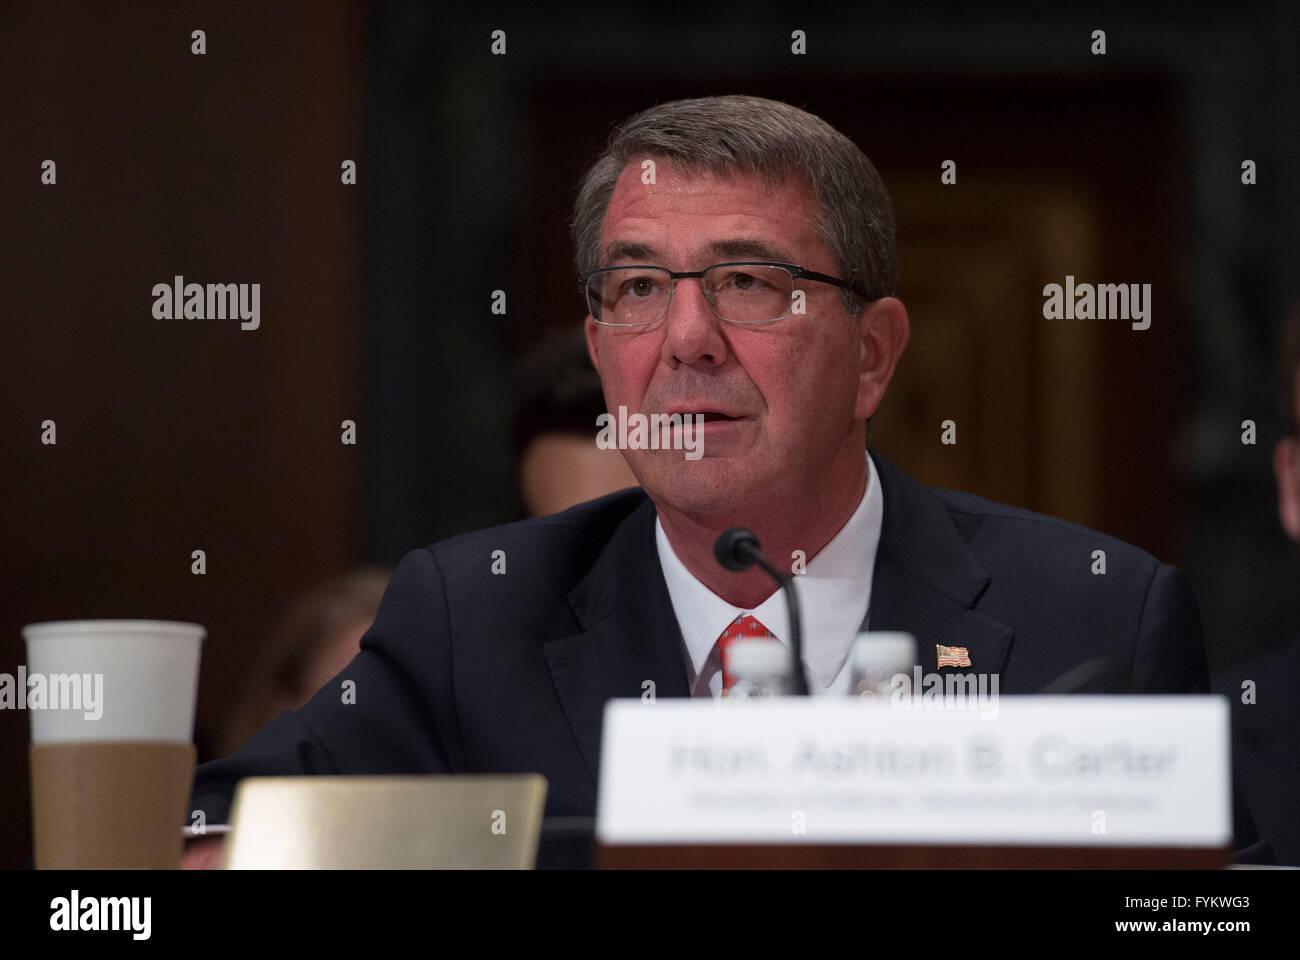 Washington DC, USA. 27th Apr, 2016. U.S. Secretary of Defense Ashton Carter testifies at the Senate Appropriations - Stock Image